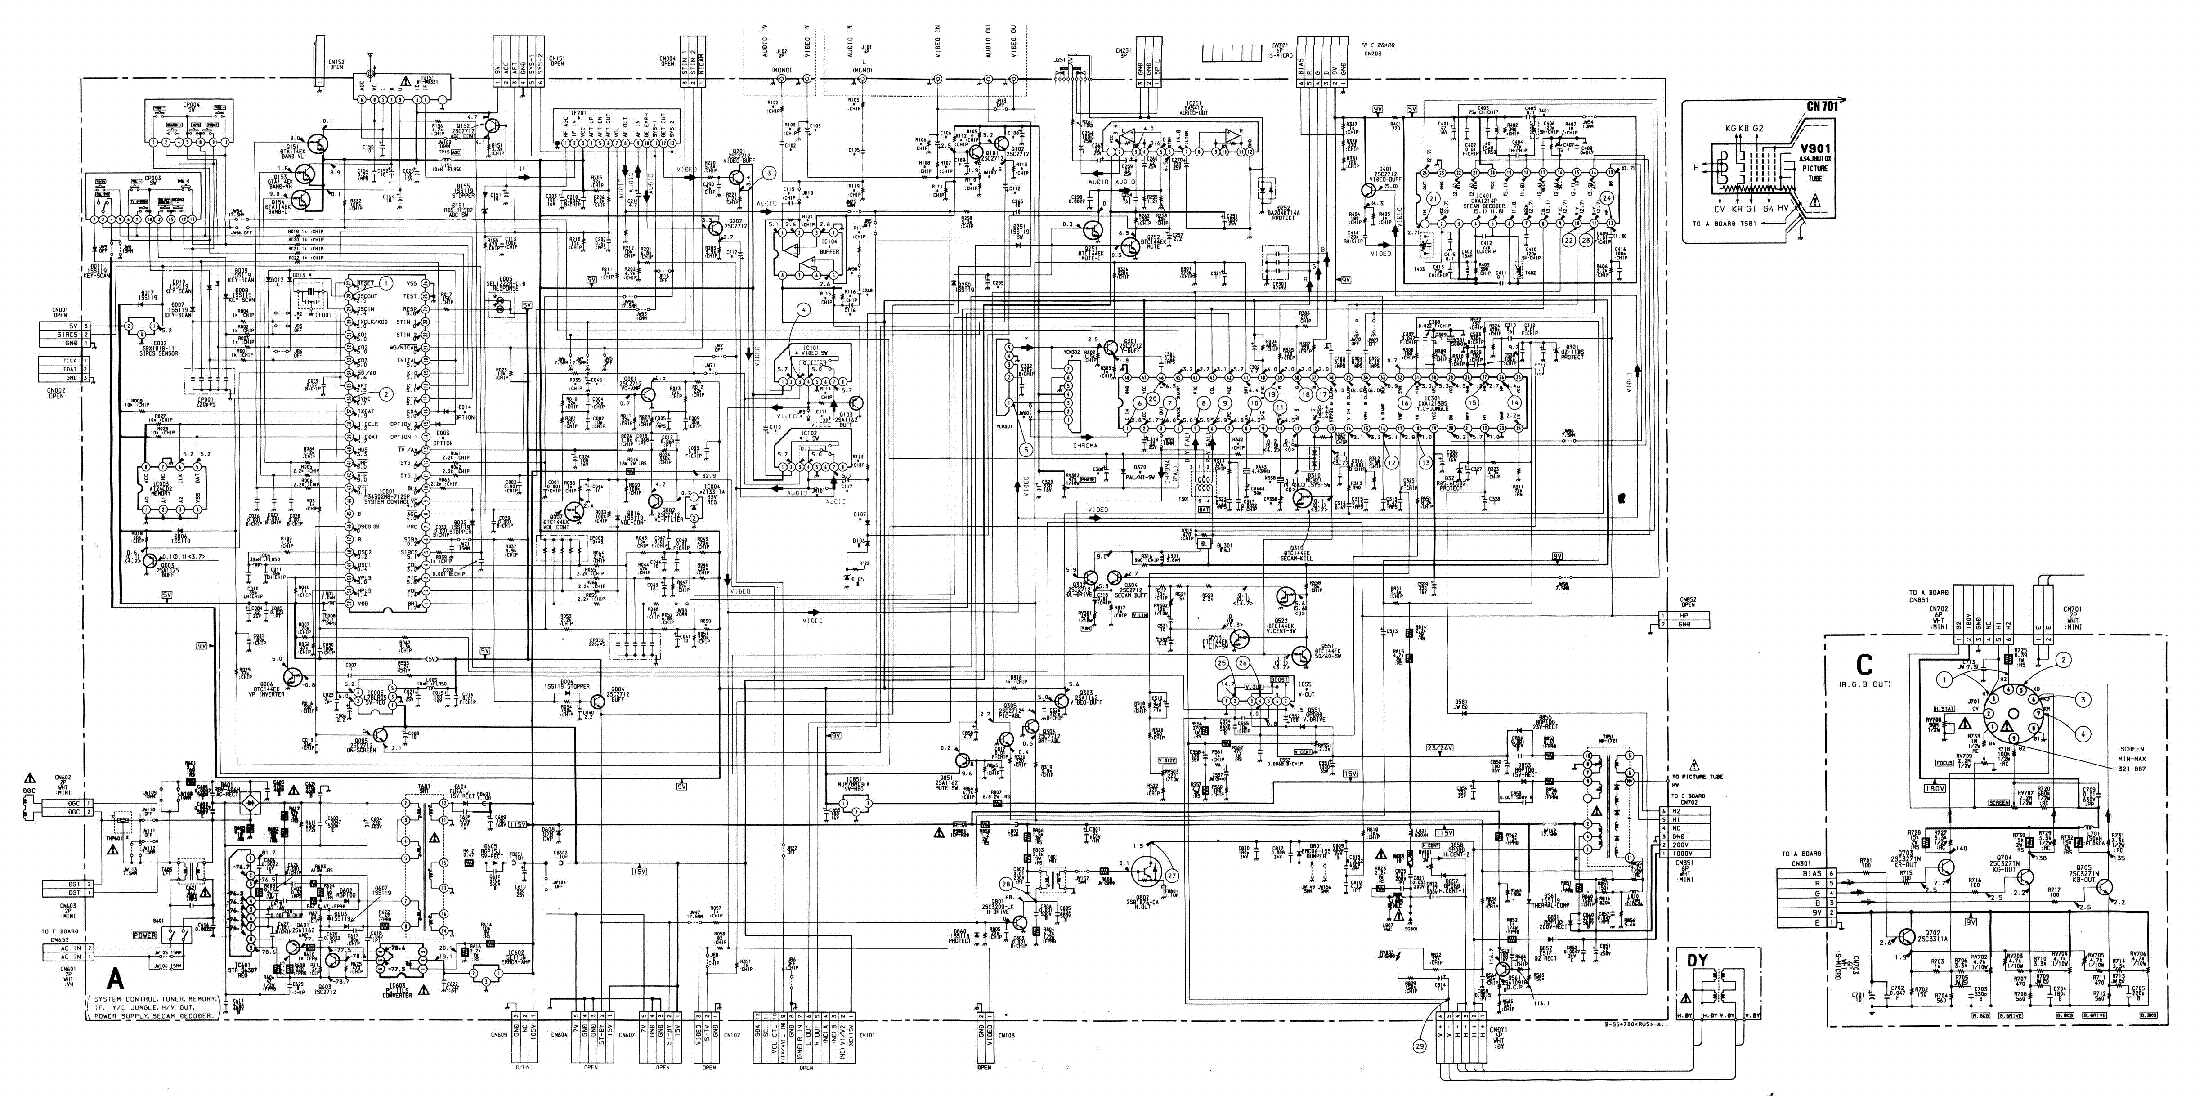 Enjoyable Sony Tv Circuit Diagram Wiring Diagram Wiring Cloud Ittabpendurdonanfuldomelitekicepsianuembamohammedshrineorg